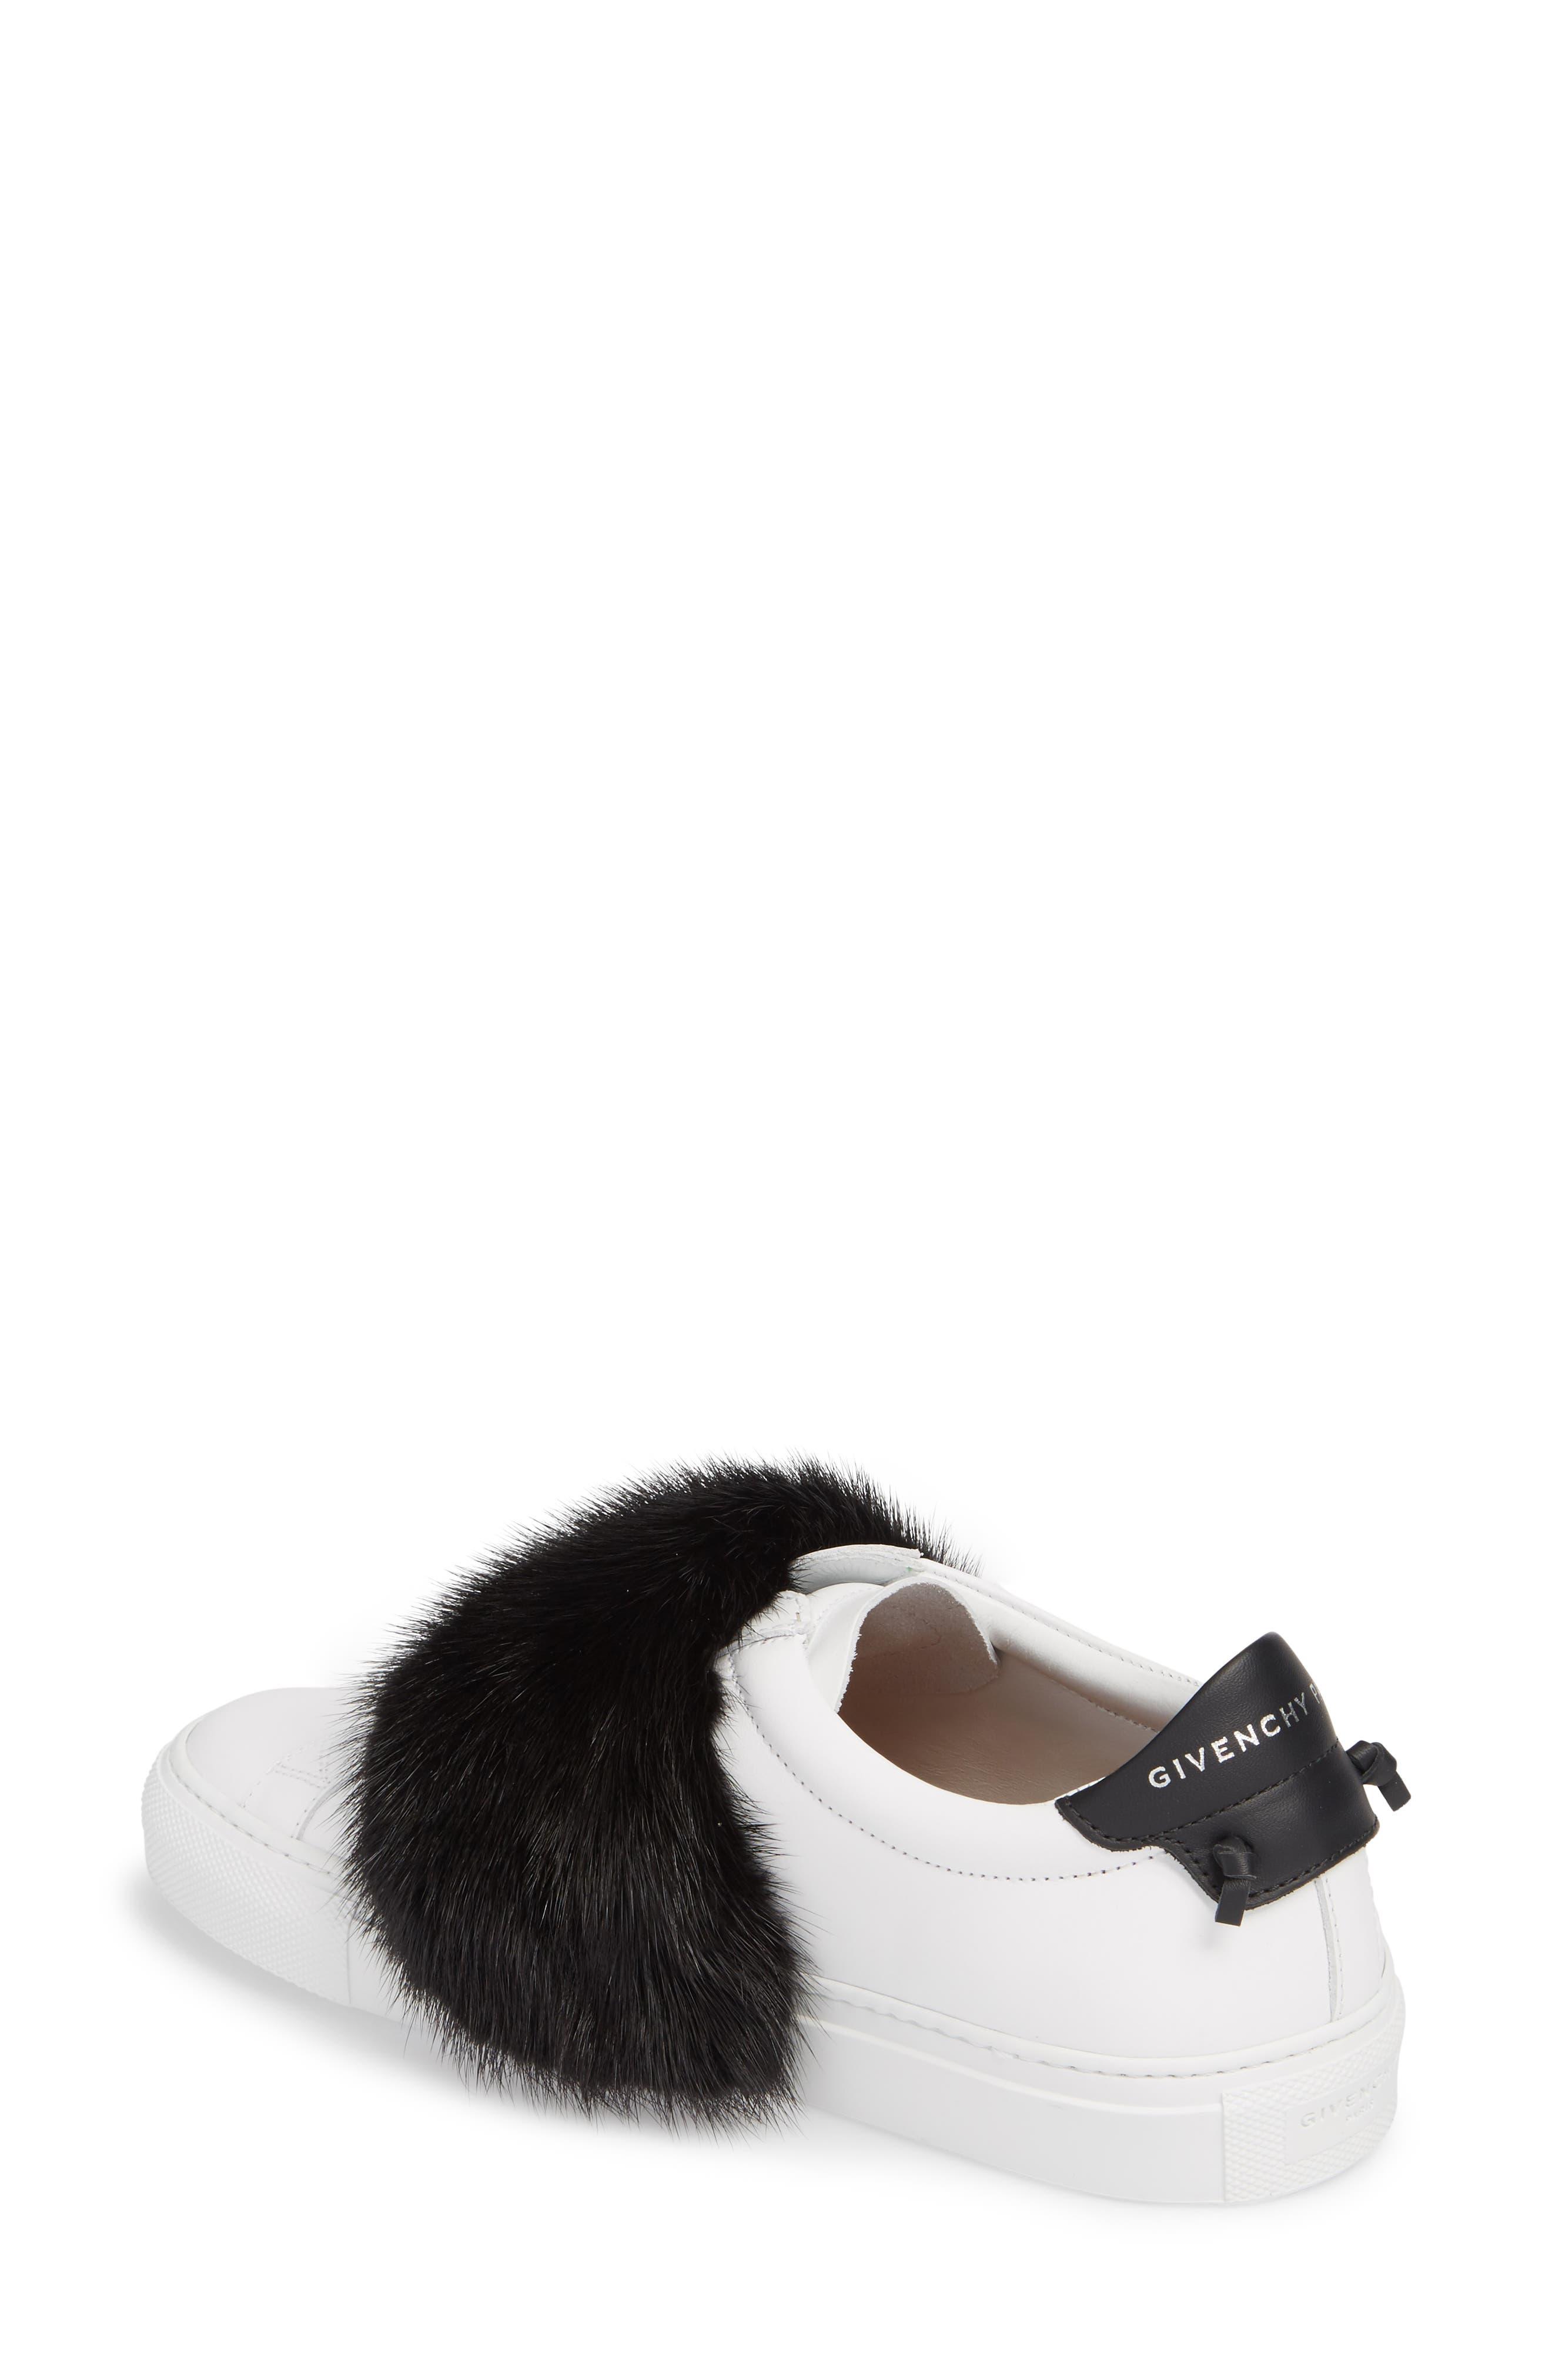 Urban Street Slip-On Sneaker with Genuine Mink Fur Trim,                             Alternate thumbnail 2, color,                             115